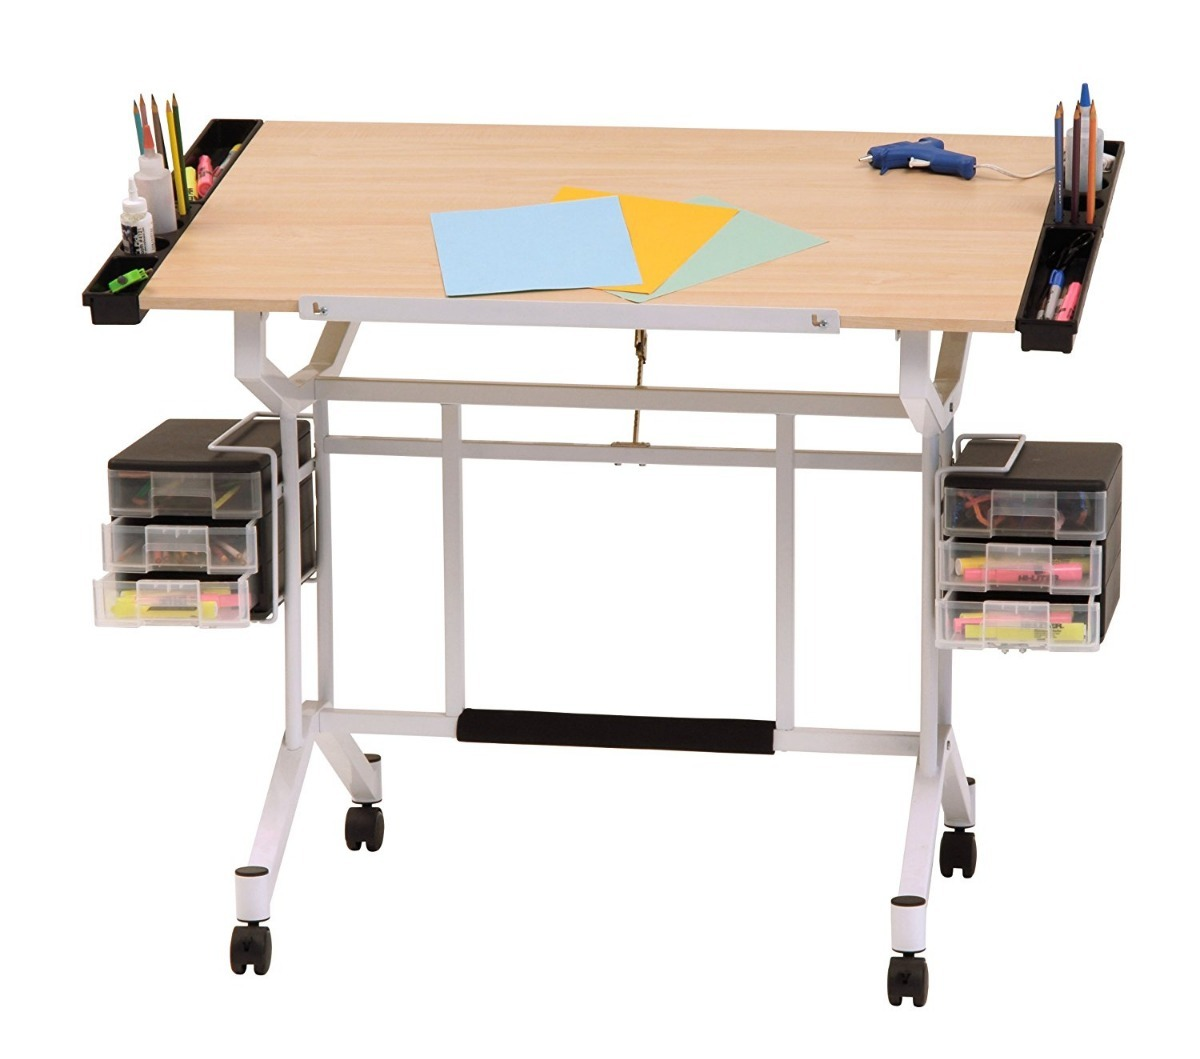 Estacion madera para dibujo escritorio plegable envio - Mesa de escritorio plegable ...